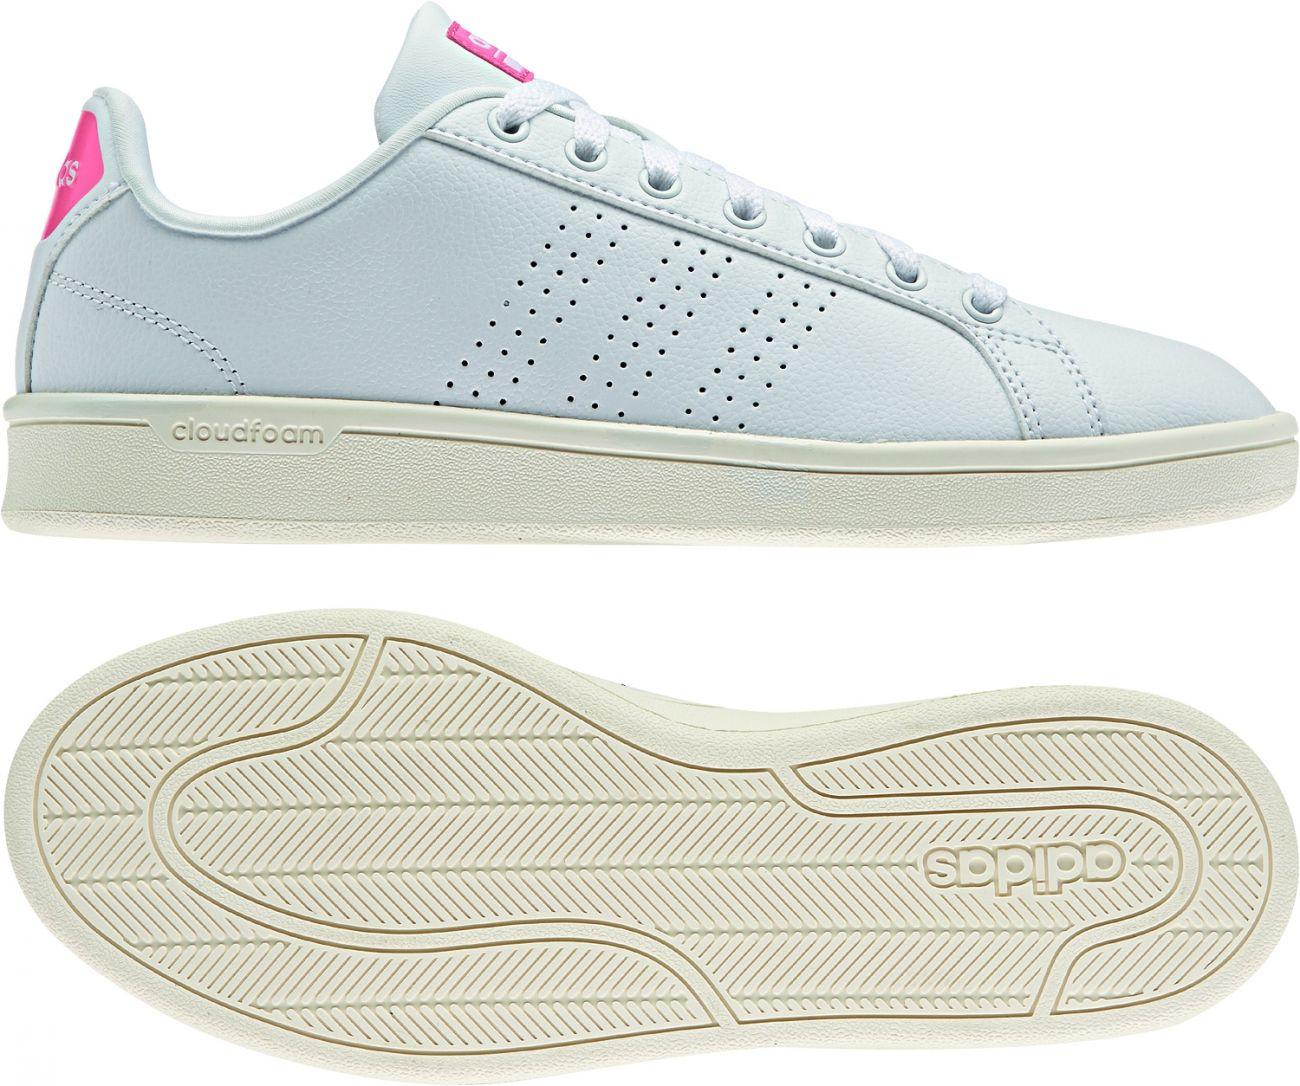 Adidas CLOUDFOAM ADVANTAGE CLEAN W BLACK BLACK BLACK online kaufen ... 69ce0f1ce6